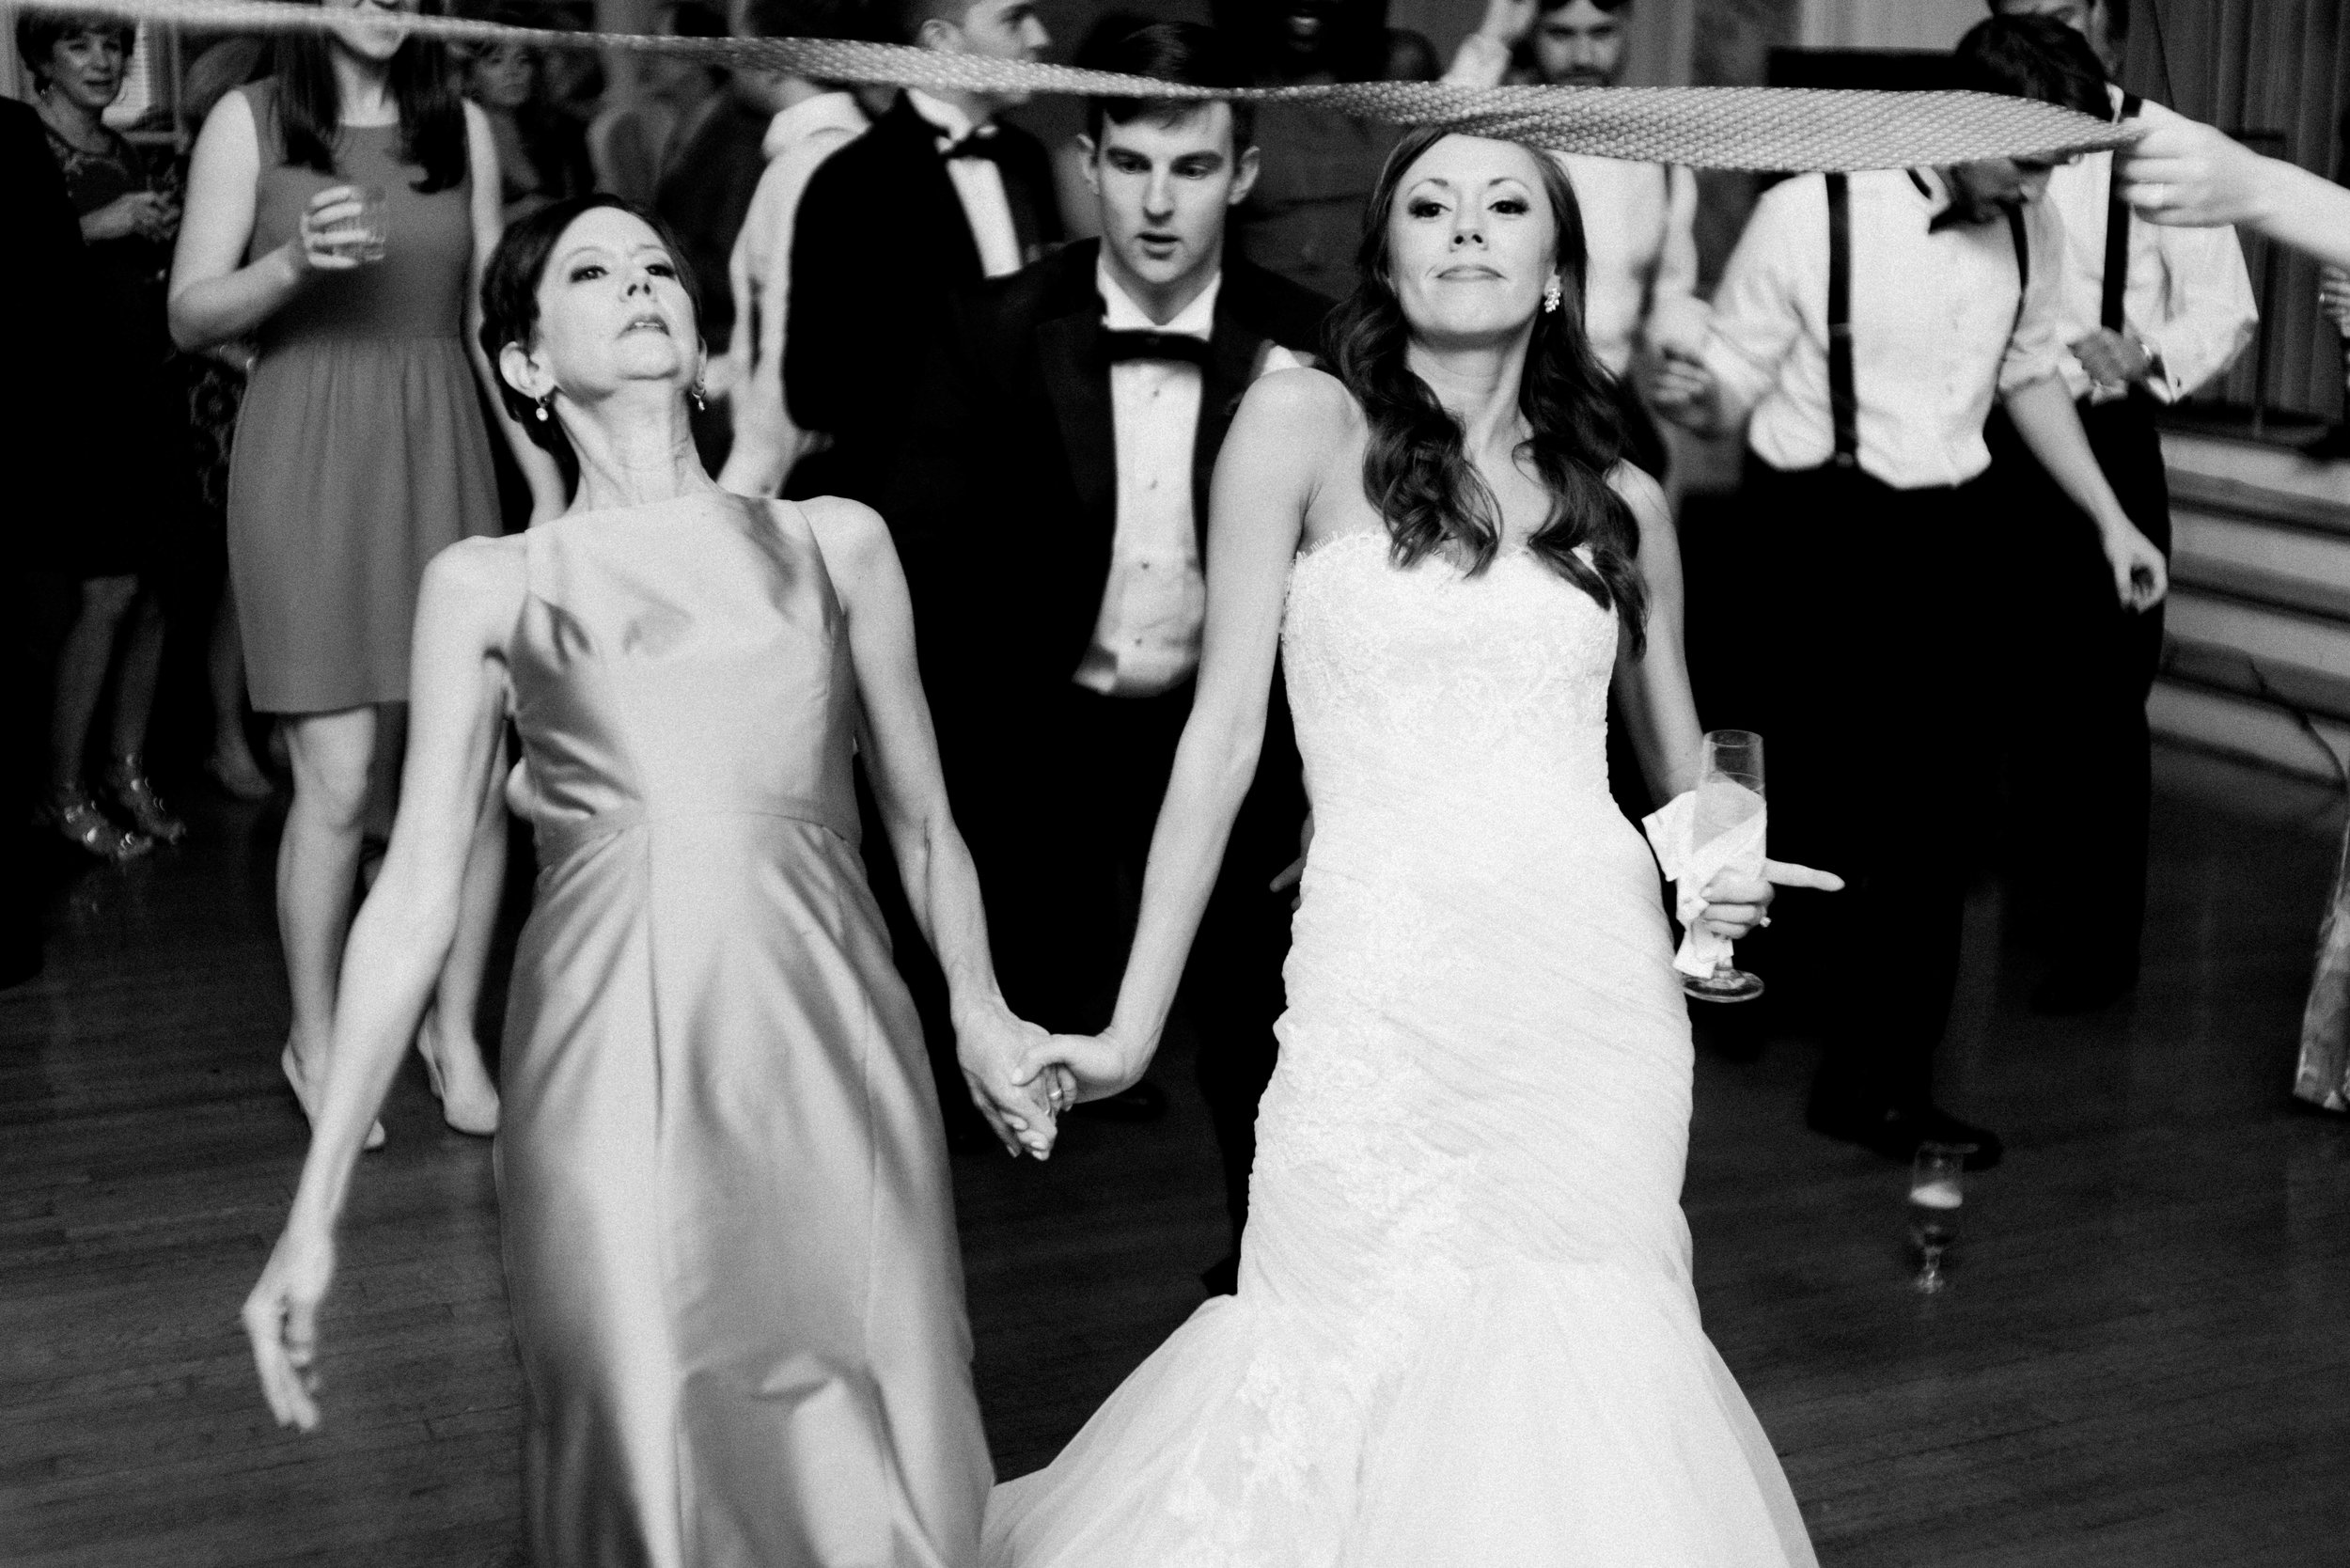 St.-Philip-Presbyterian-Church-Houston-Wedding-Ceremony-The-Junior-League-Of-Houston-Reception-Dana-Fernandez-Photography-Fine-Art-Film-32.jpg